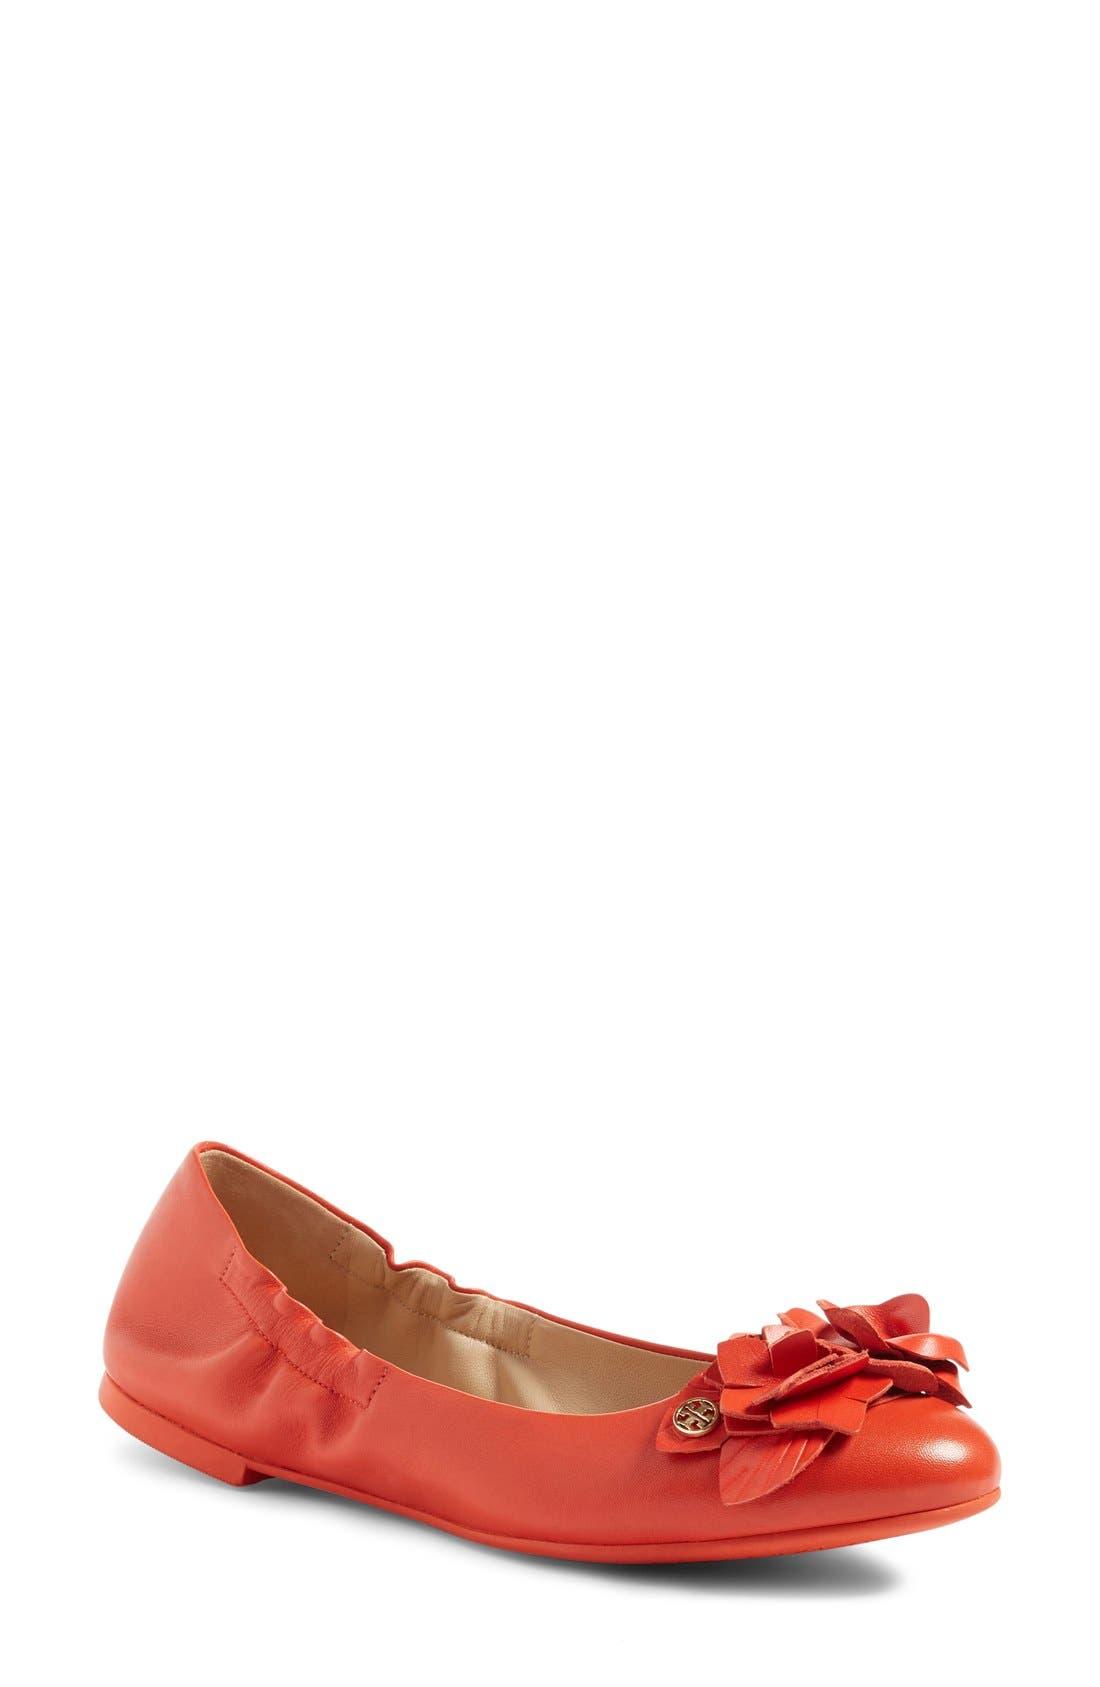 Alternate Image 1 Selected - Tory Burch 'Blossom' Ballet Flat (Women)